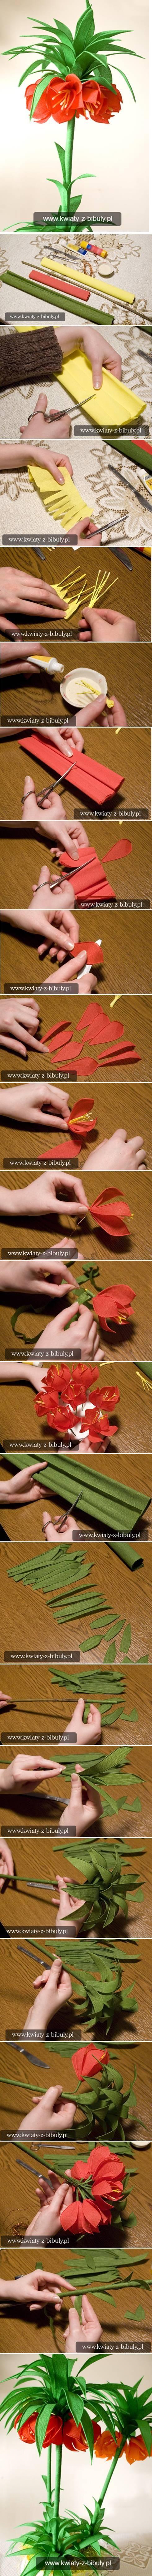 DIY Tutorial: DIY crepe paper flowers / DIY Pretty Crepe Paper Flower - Bead&Cord